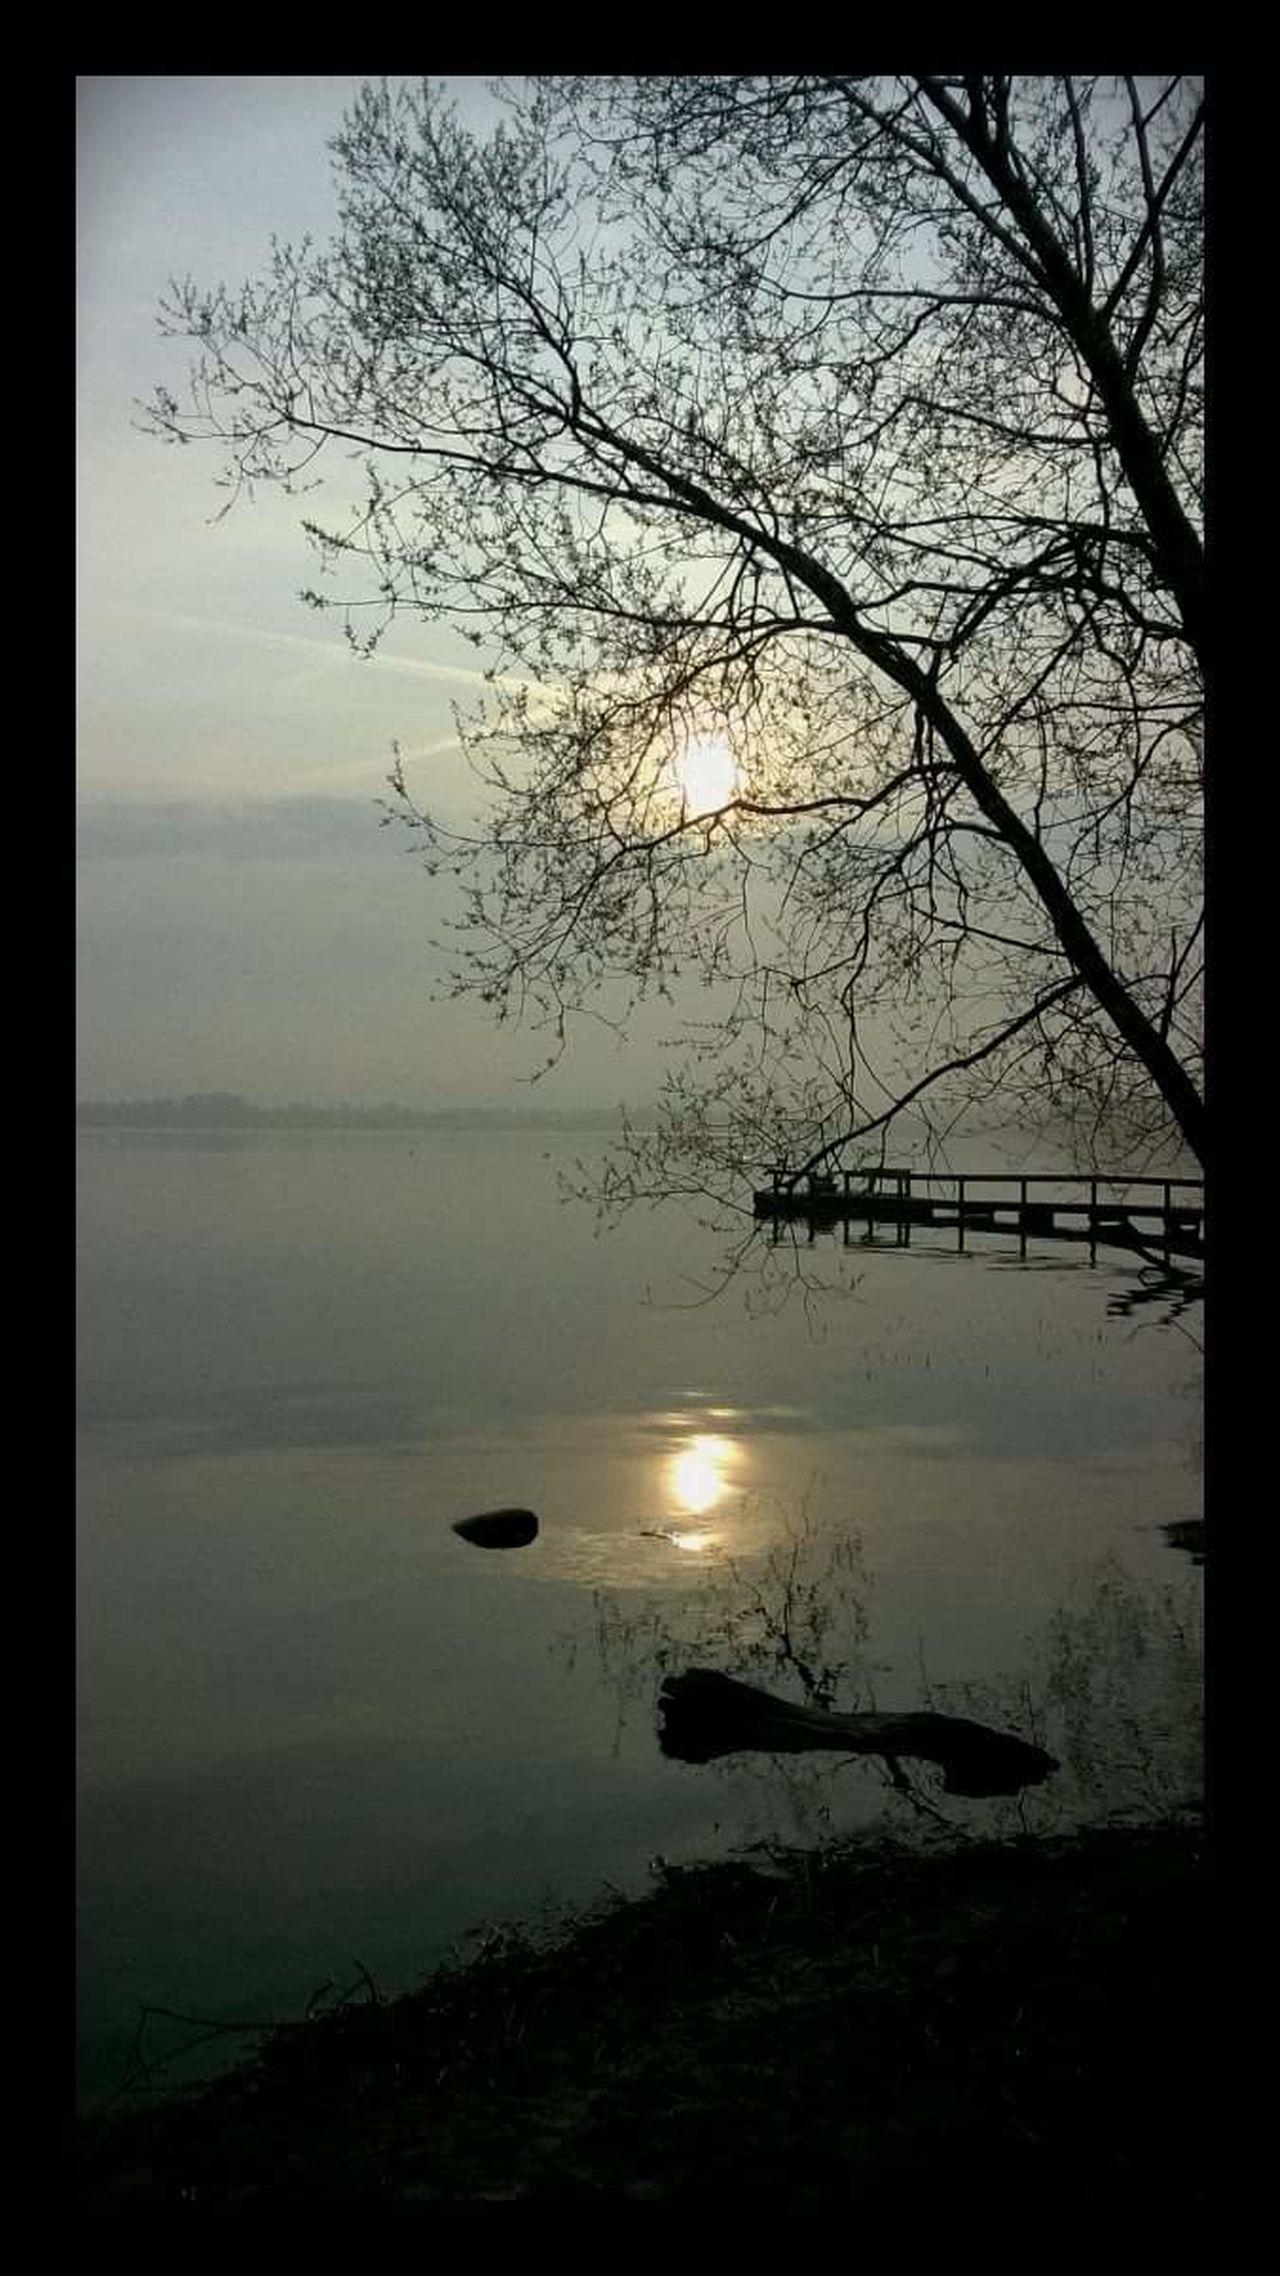 Reflection Water Scenics Lake Lake View Beauty In Nature Tranquility Nature Sky Day Outdoors Tree Denmark 🇩🇰 Danmark Furesø EyeEm EyeEm Nature Lover watCloud - Sky Clouds Overskyet Sø Morgen Morning Light Sunlight